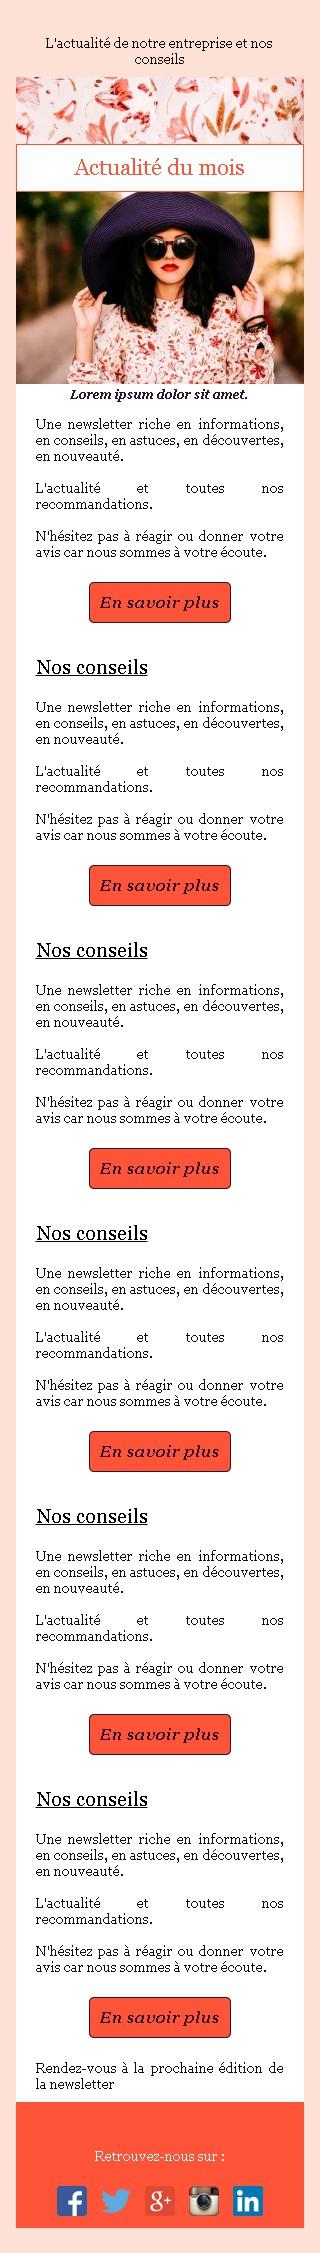 Newsletter sobre avec edito et bouton